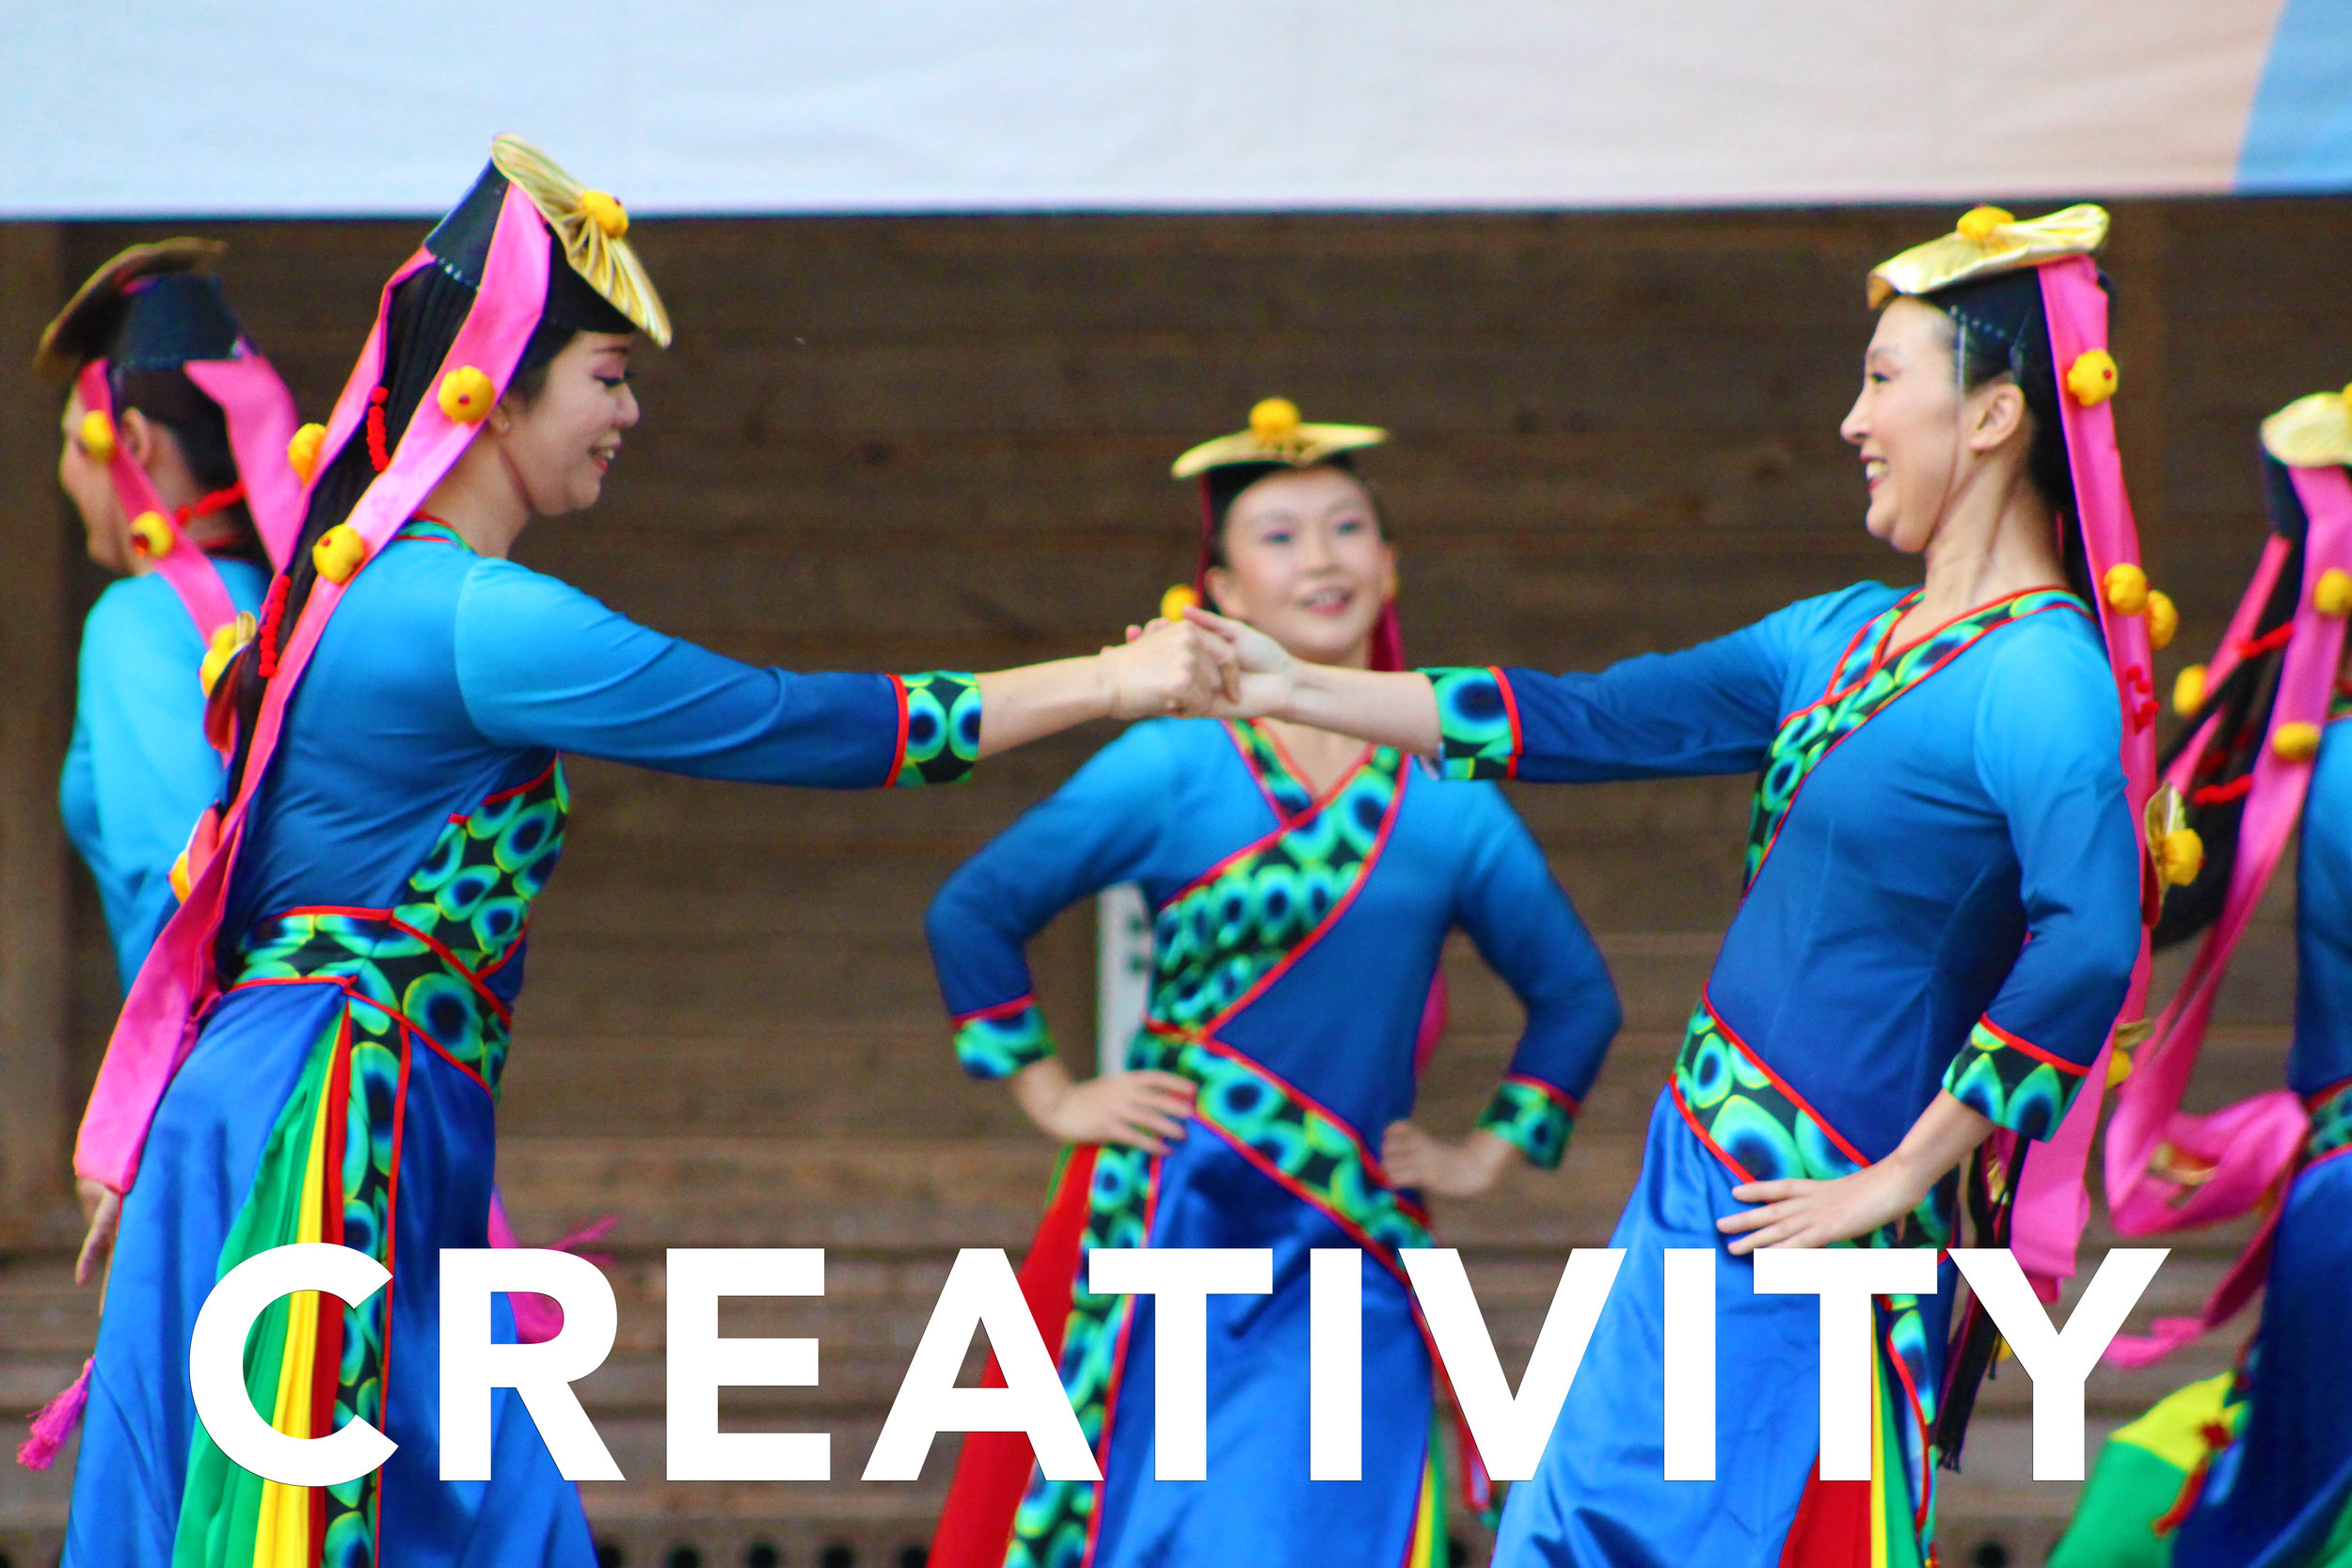 Creativity Header.jpg